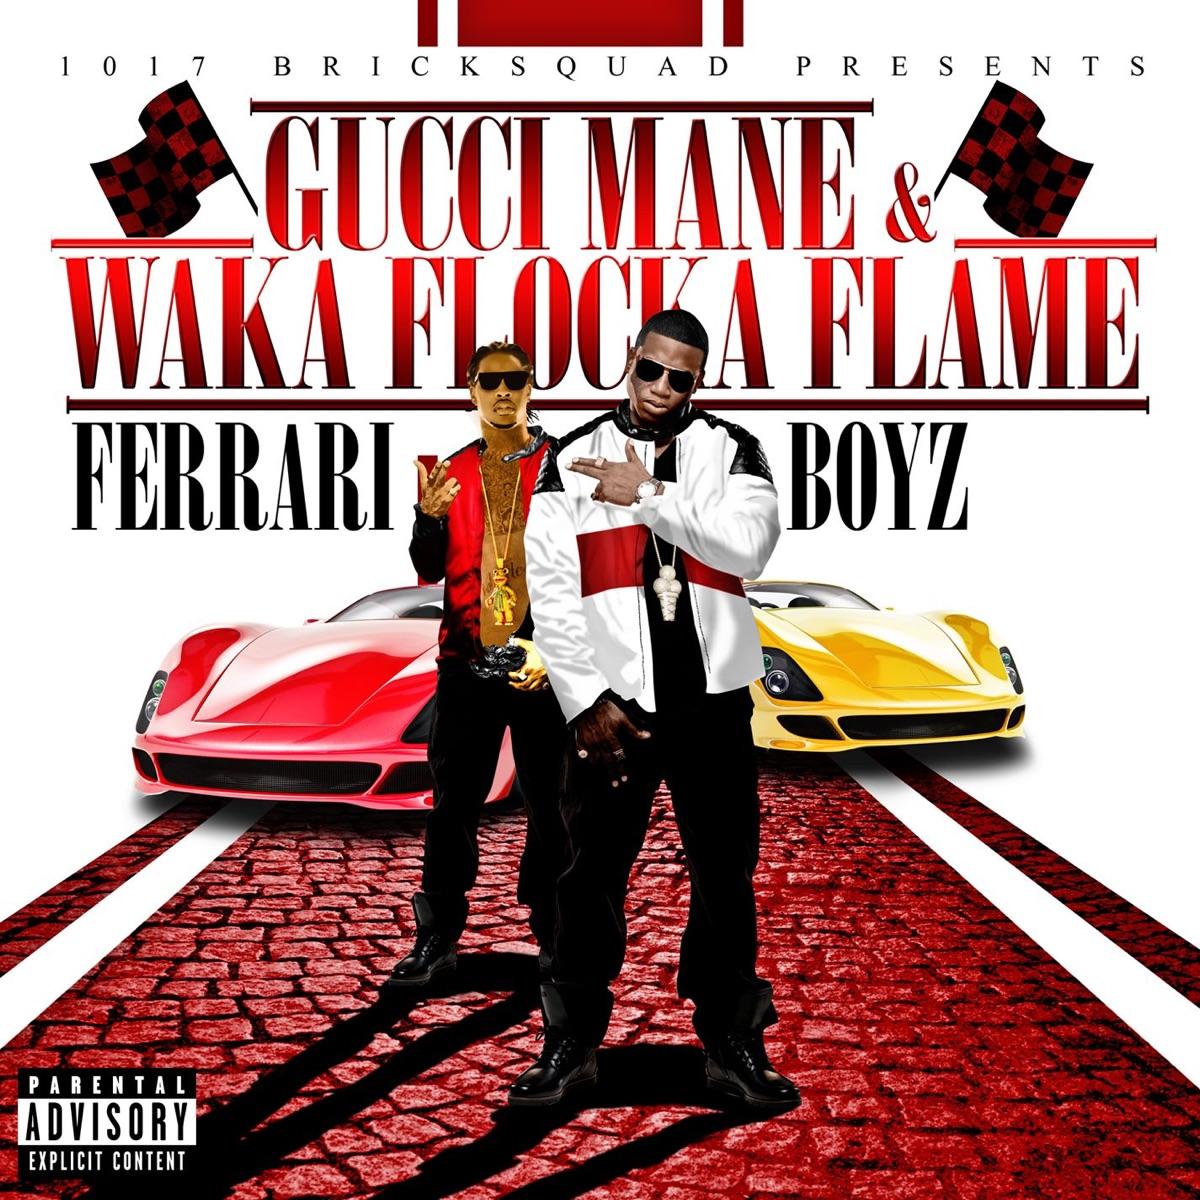 Ferrari Boyz Album Cover by Gucci Mane & Waka Flocka Flame